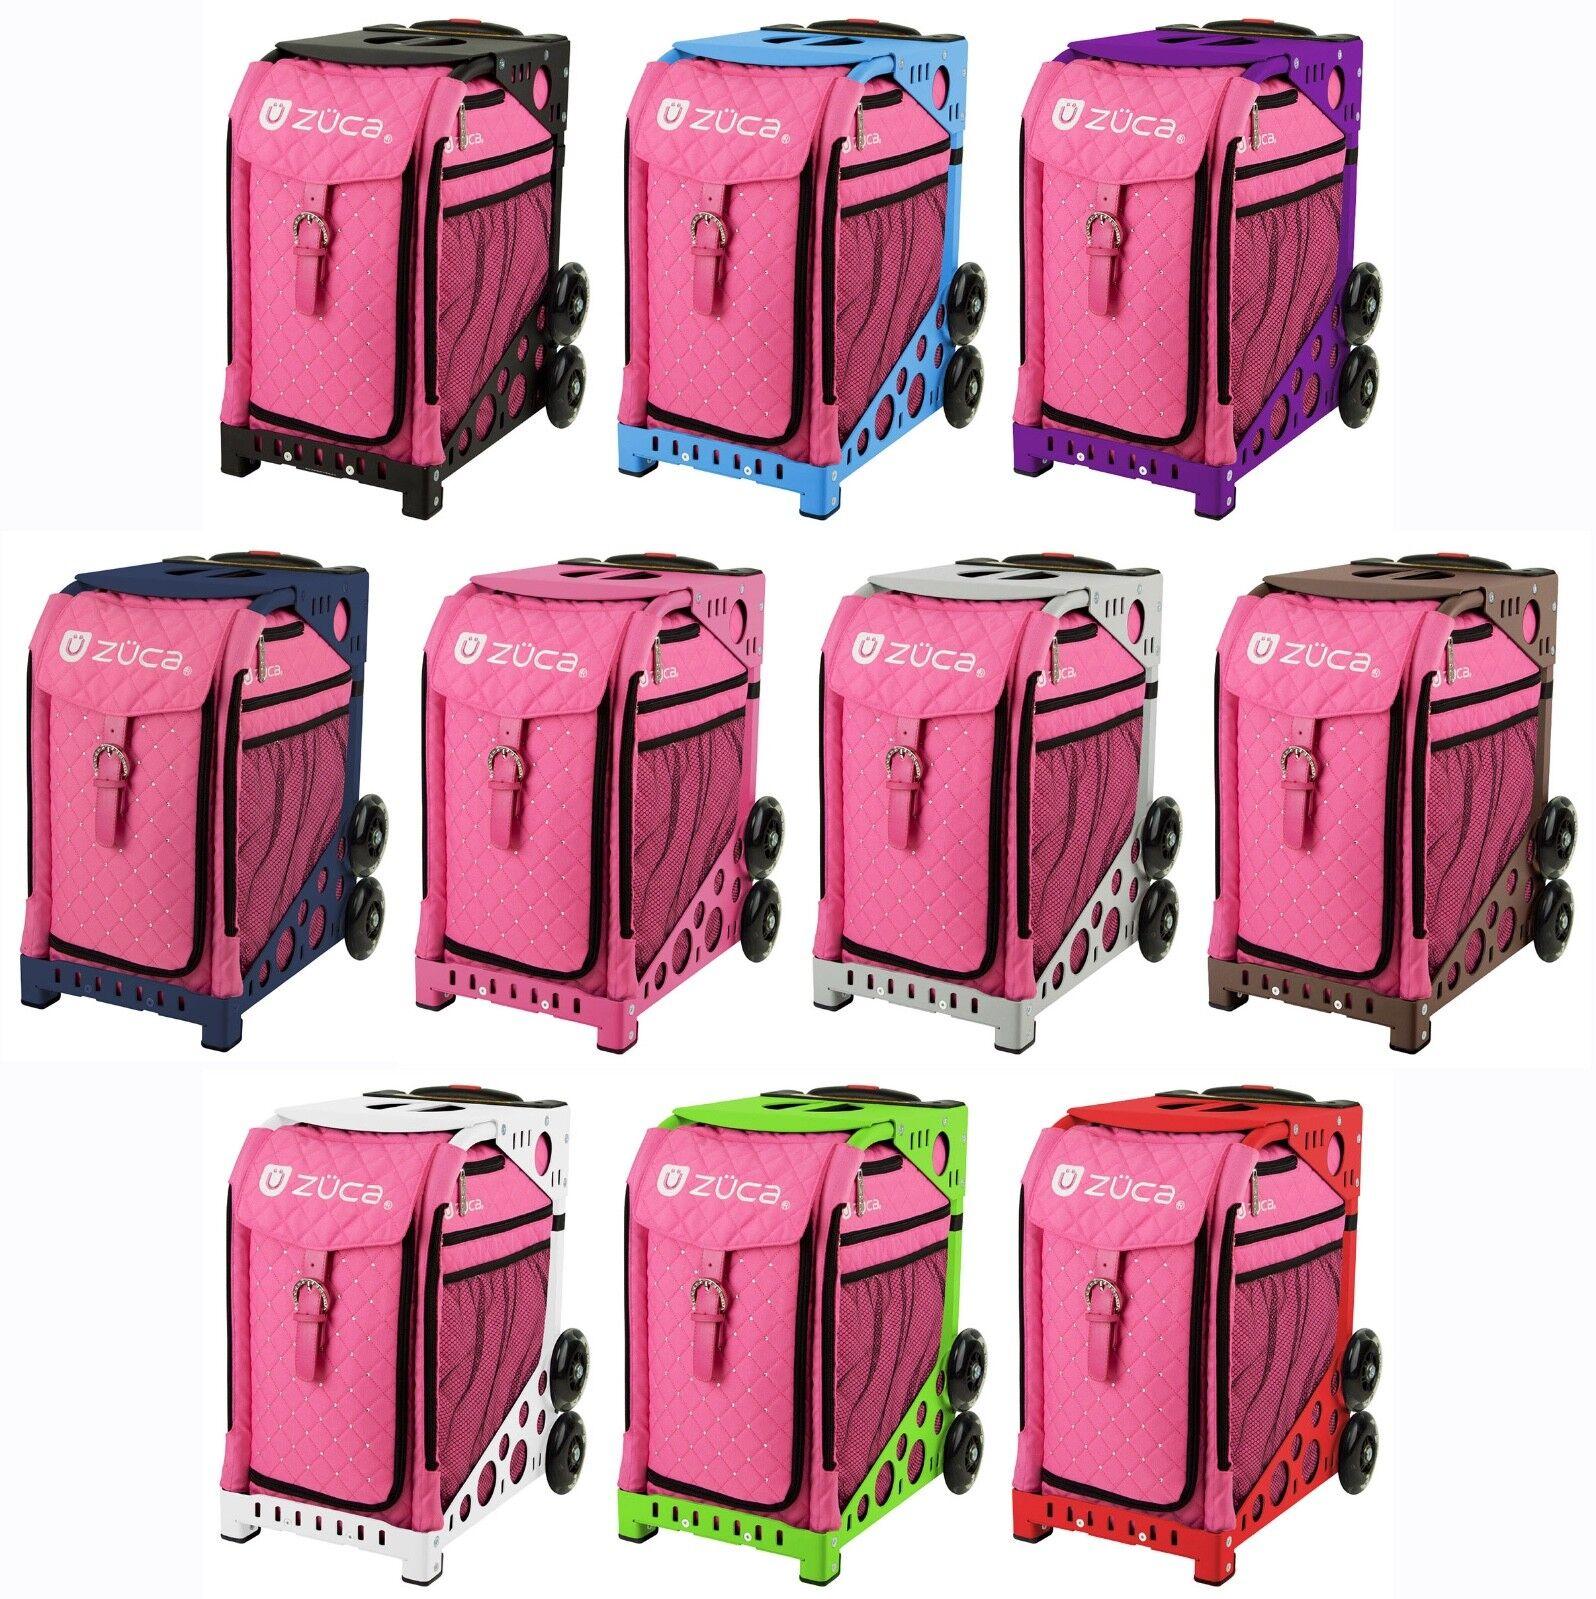 ZUCA Bag PINK HOT - Sports Frame & Insert Bag - FREE Seat Cushion